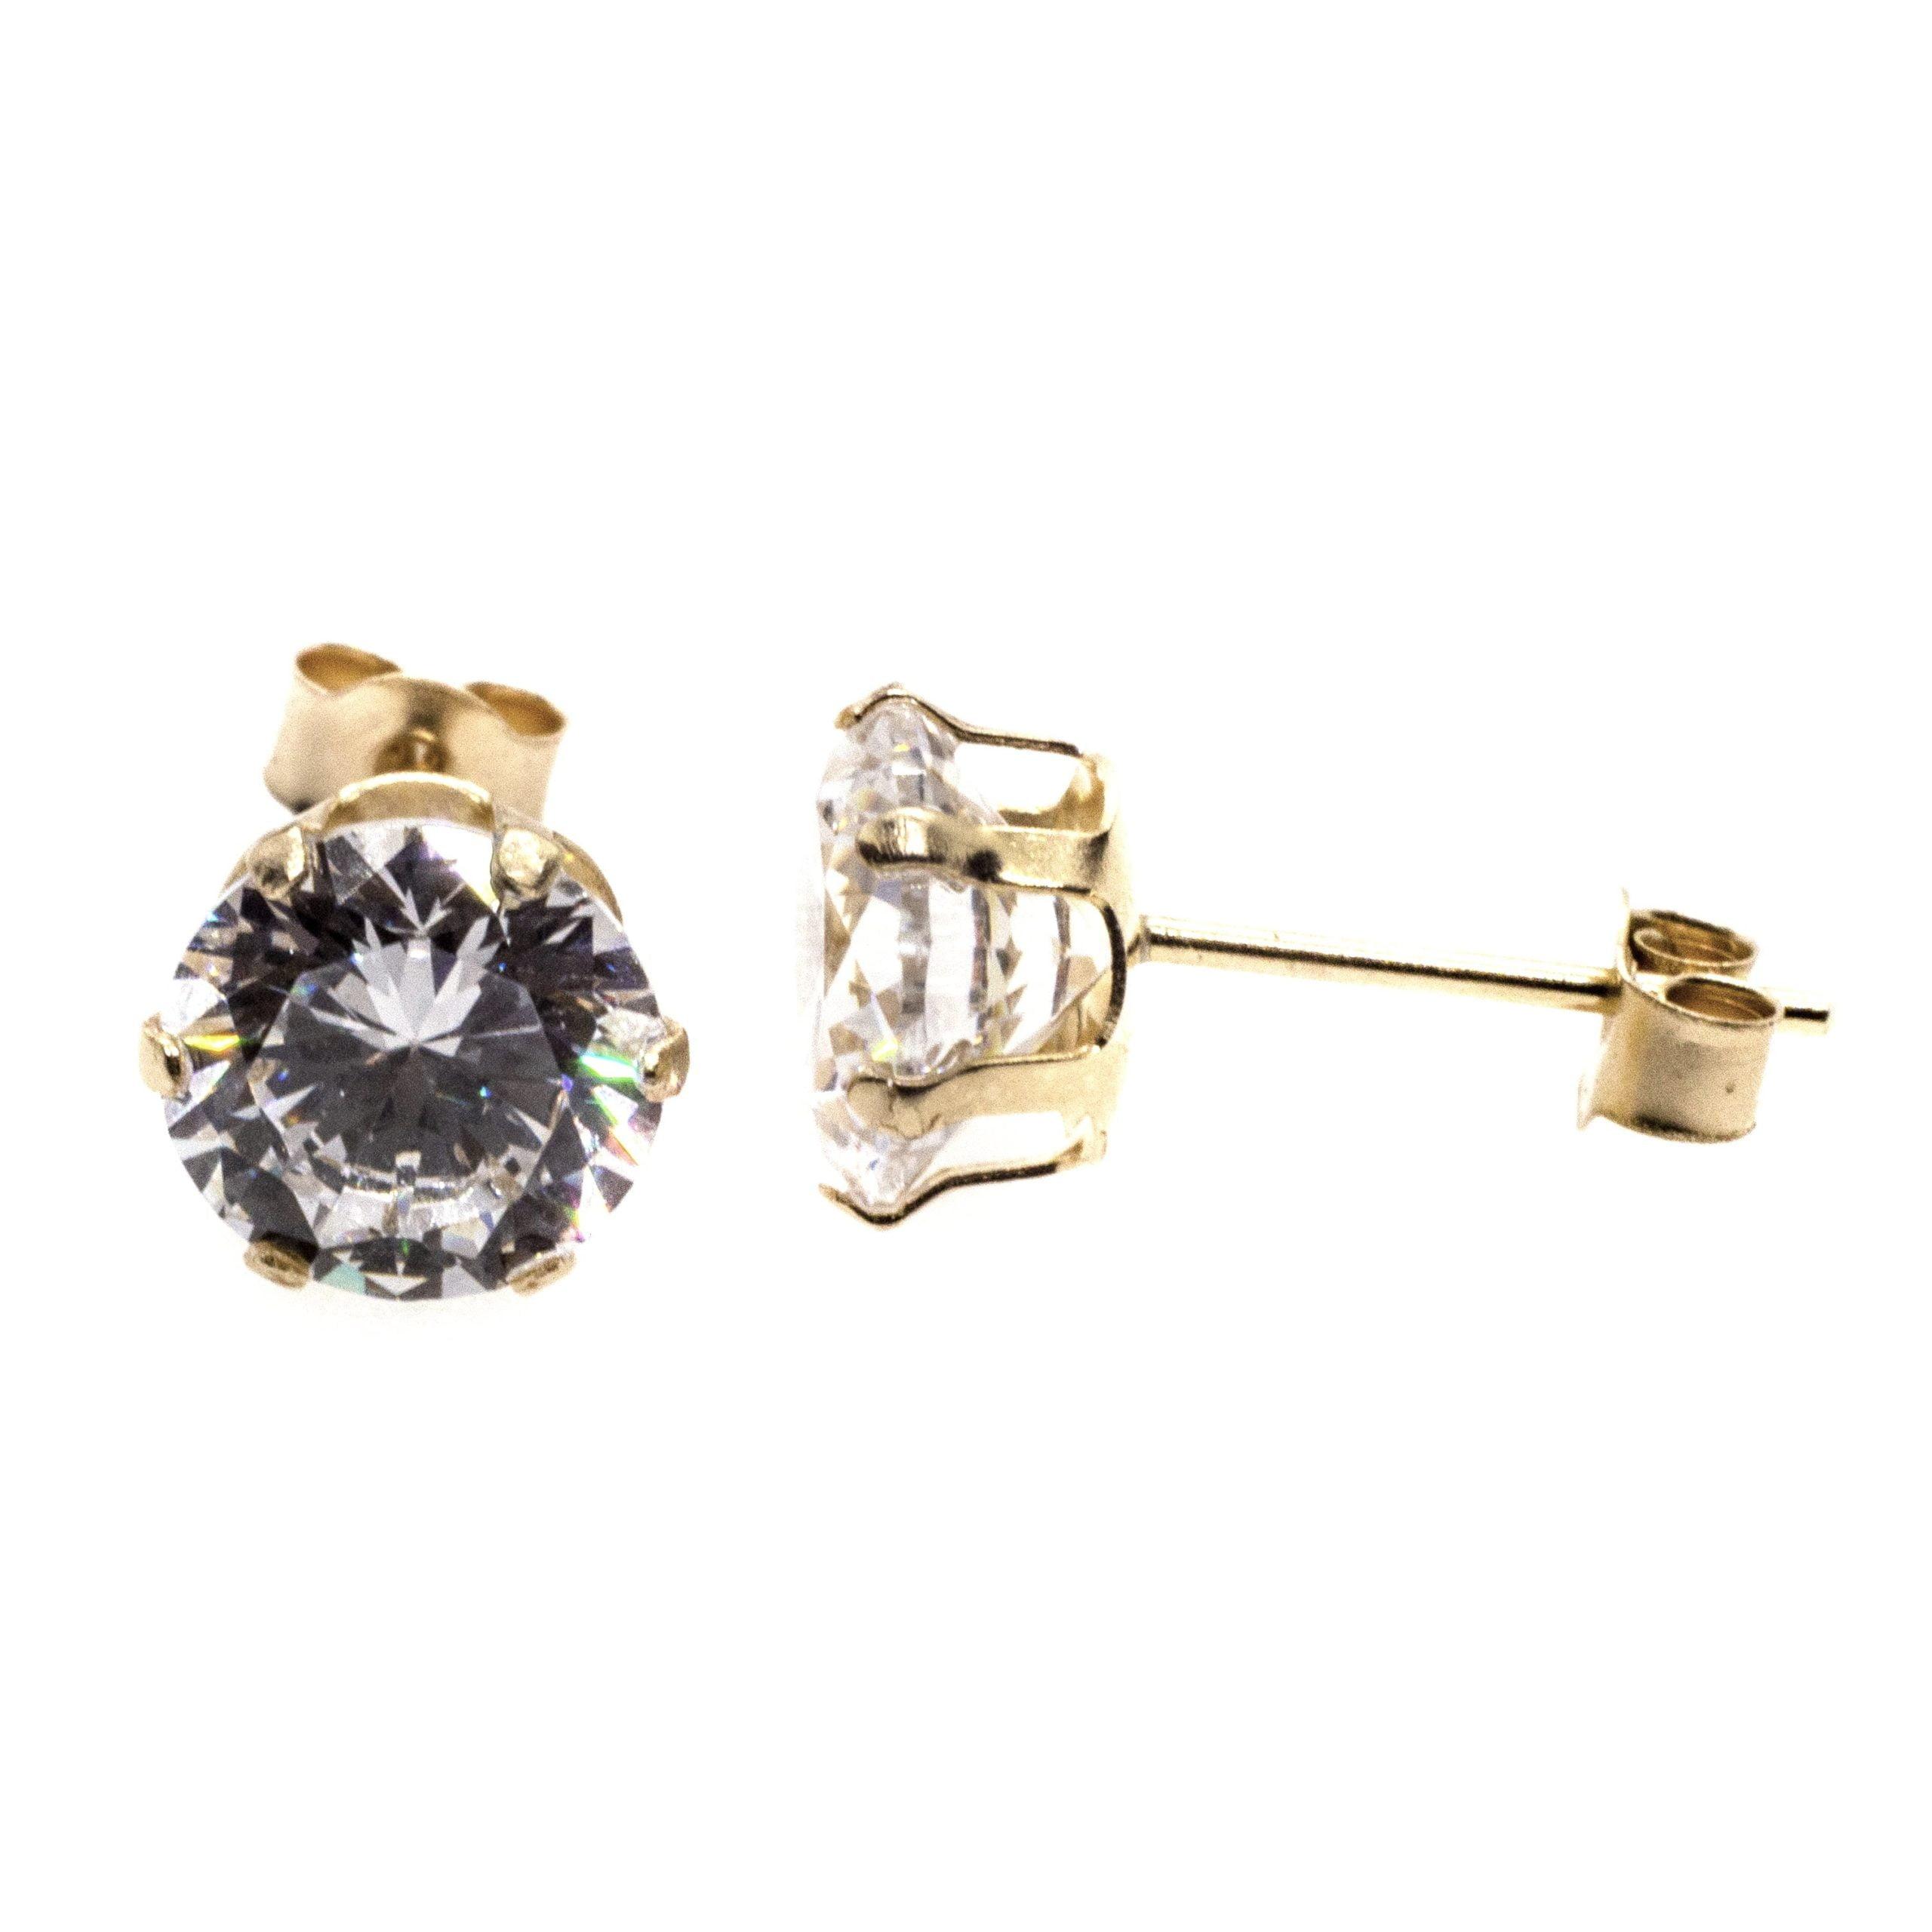 6mm CZ stud earrings 9ct yellow gold alt 3